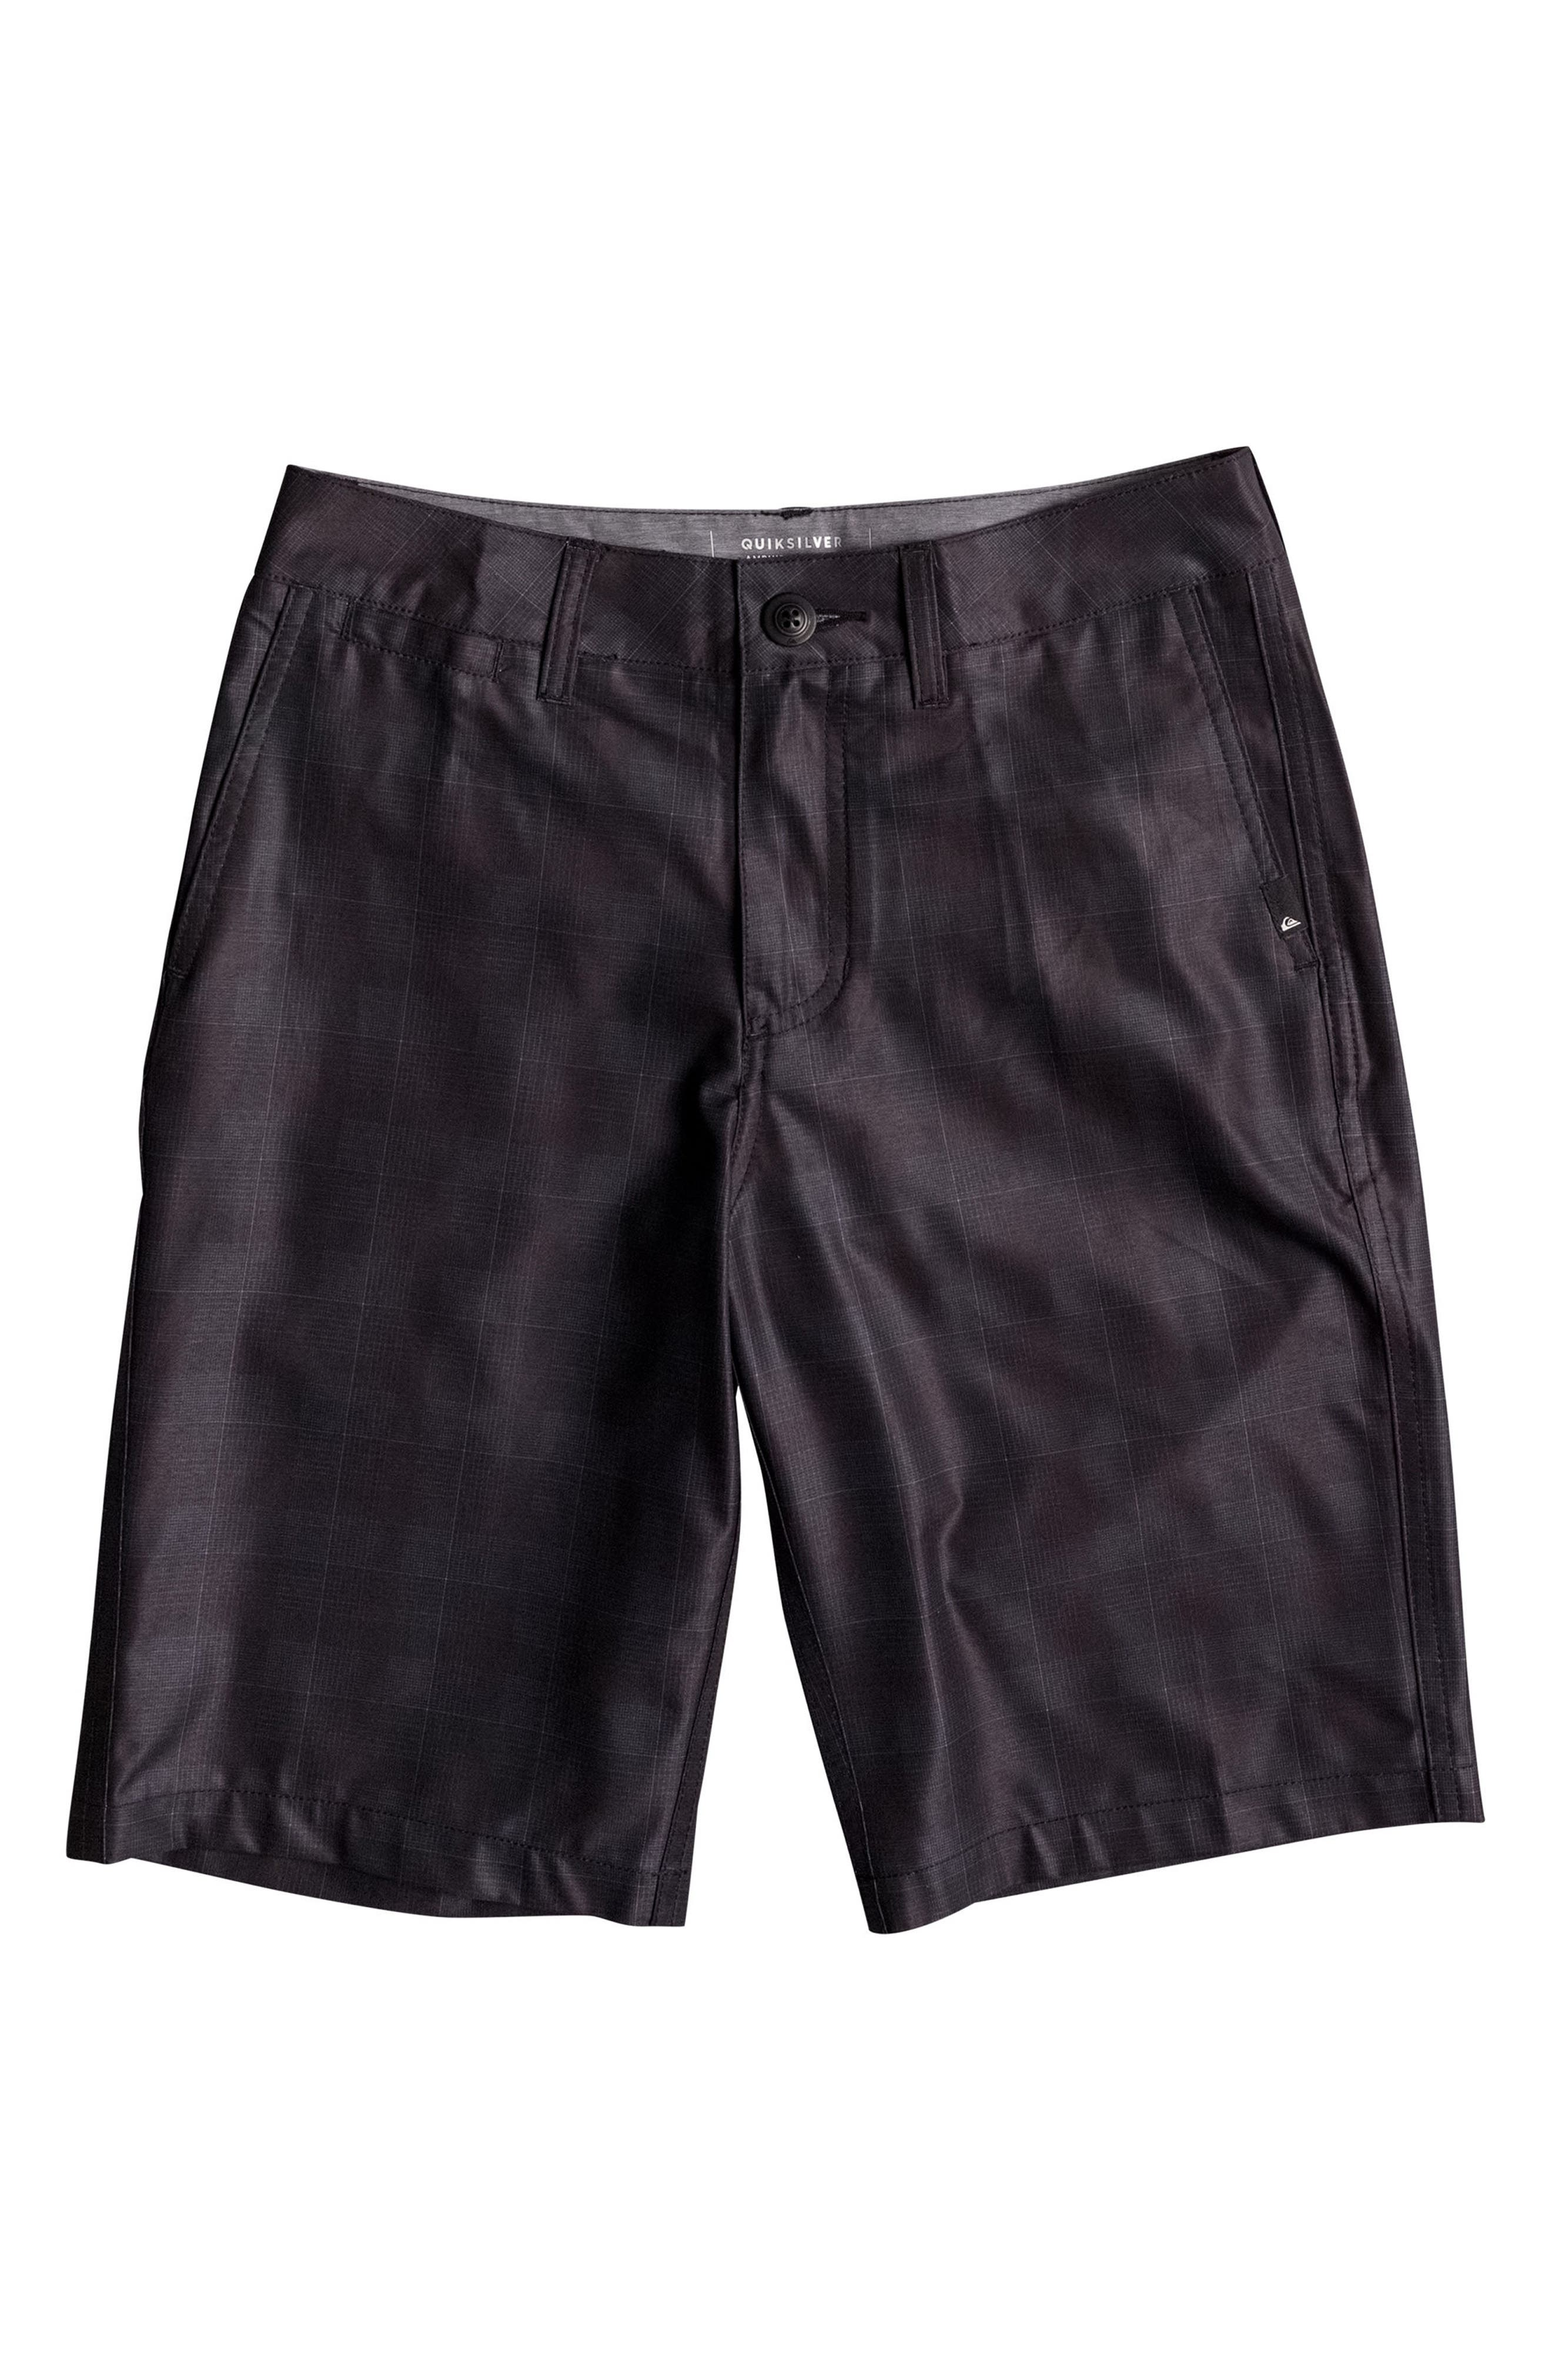 Union Plaid Amphibian Hybrid Shorts,                             Main thumbnail 1, color,                             002